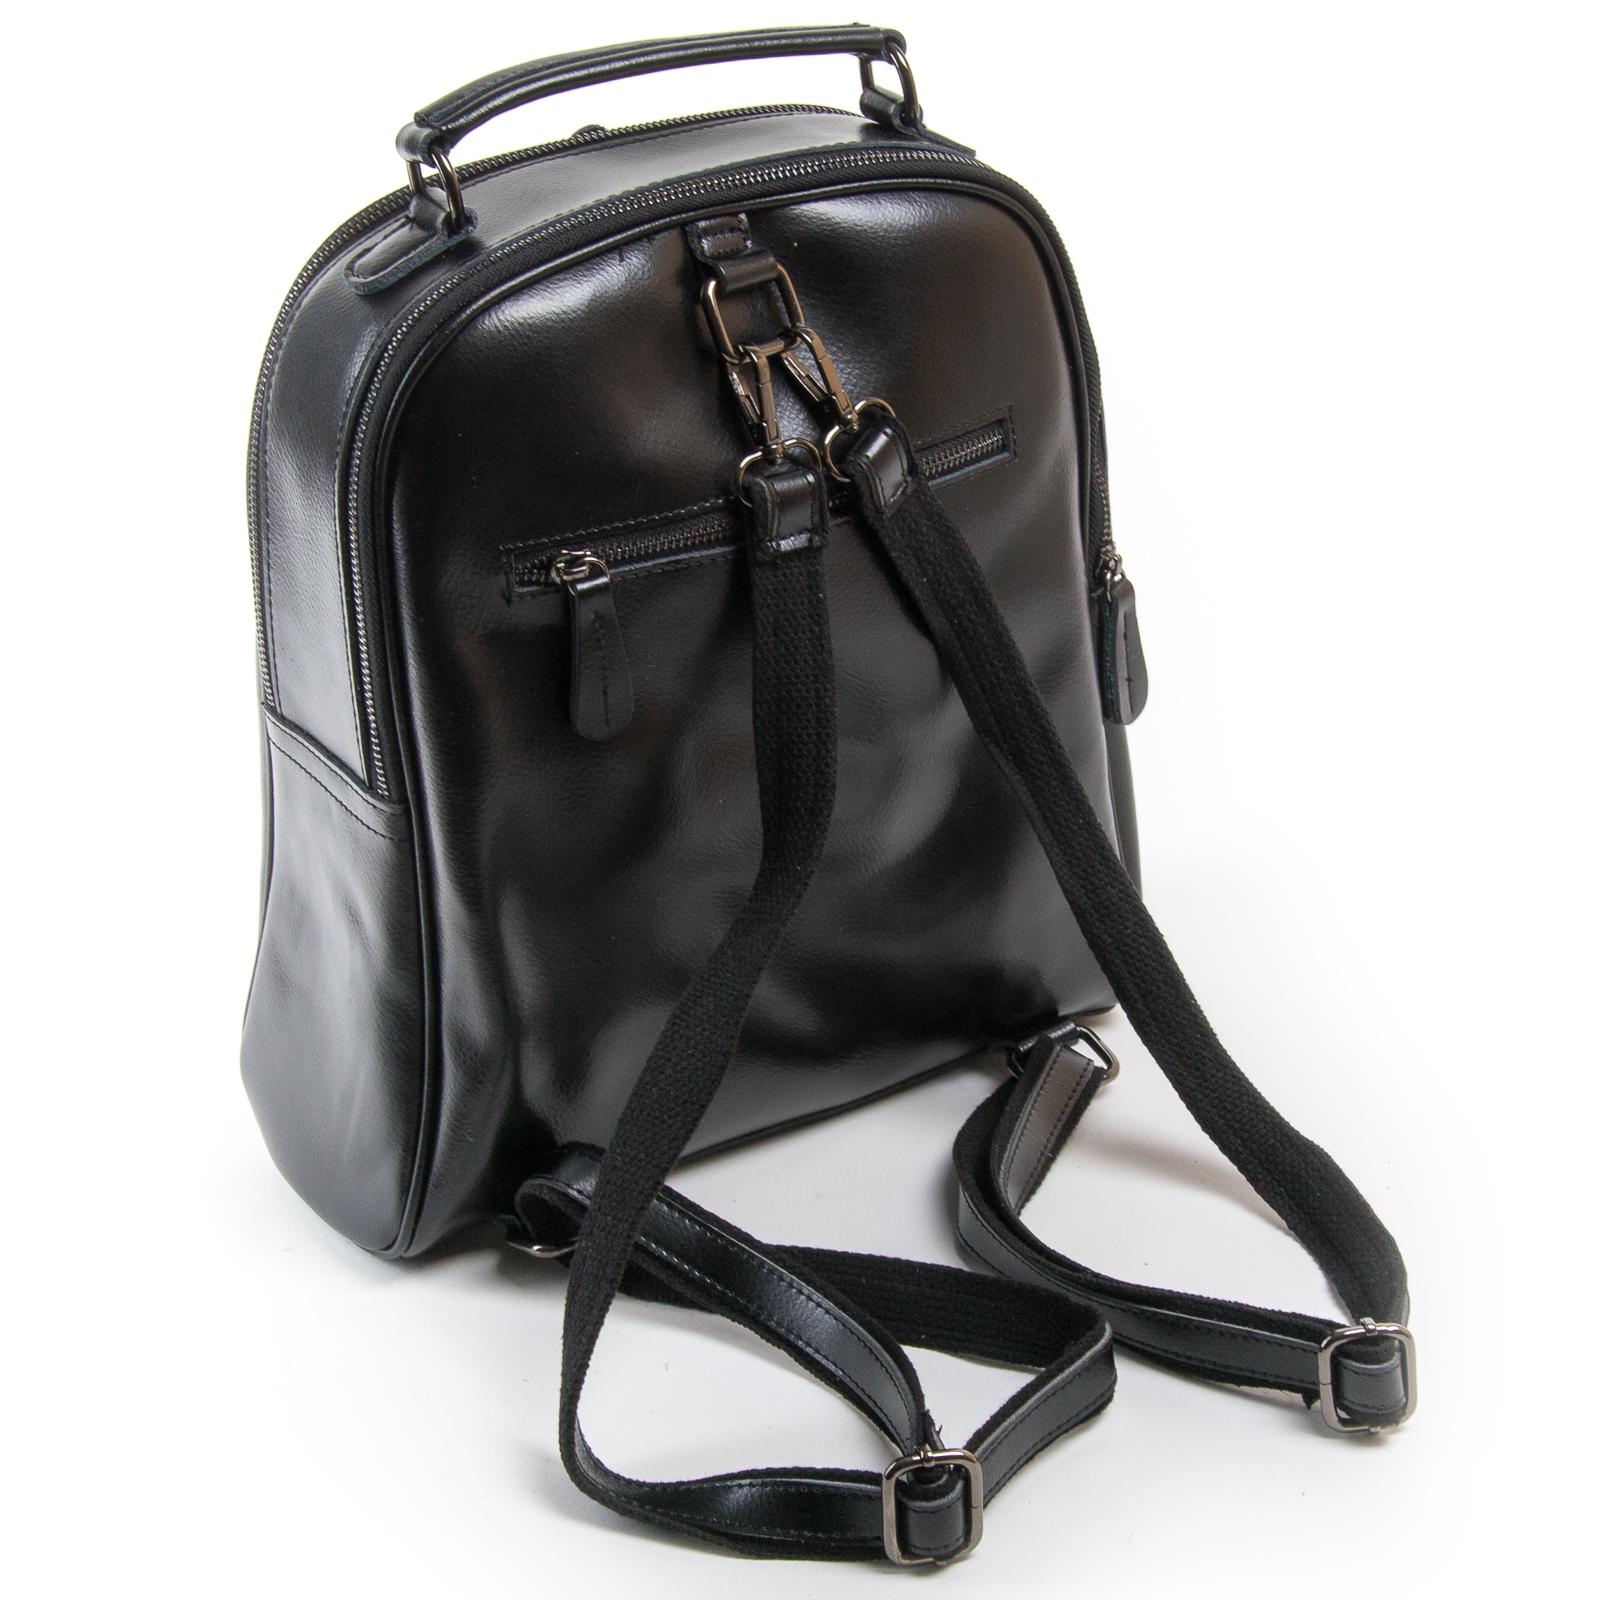 Сумка Женская Рюкзак кожа ALEX RAI 8694-3 black - фото 4